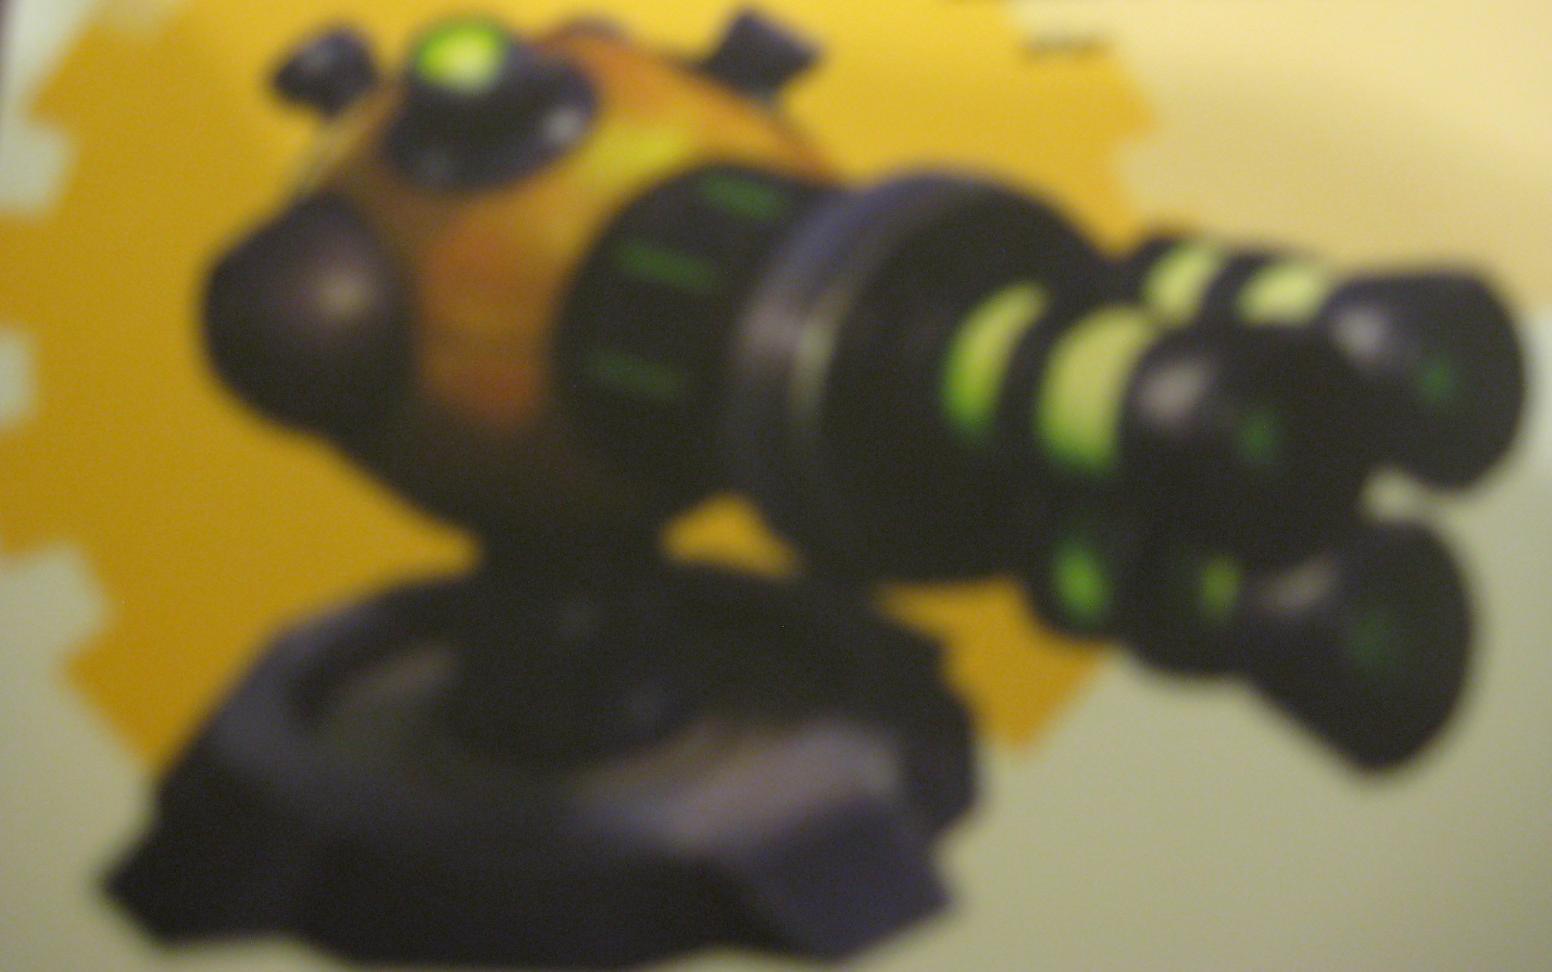 Fusion Turret